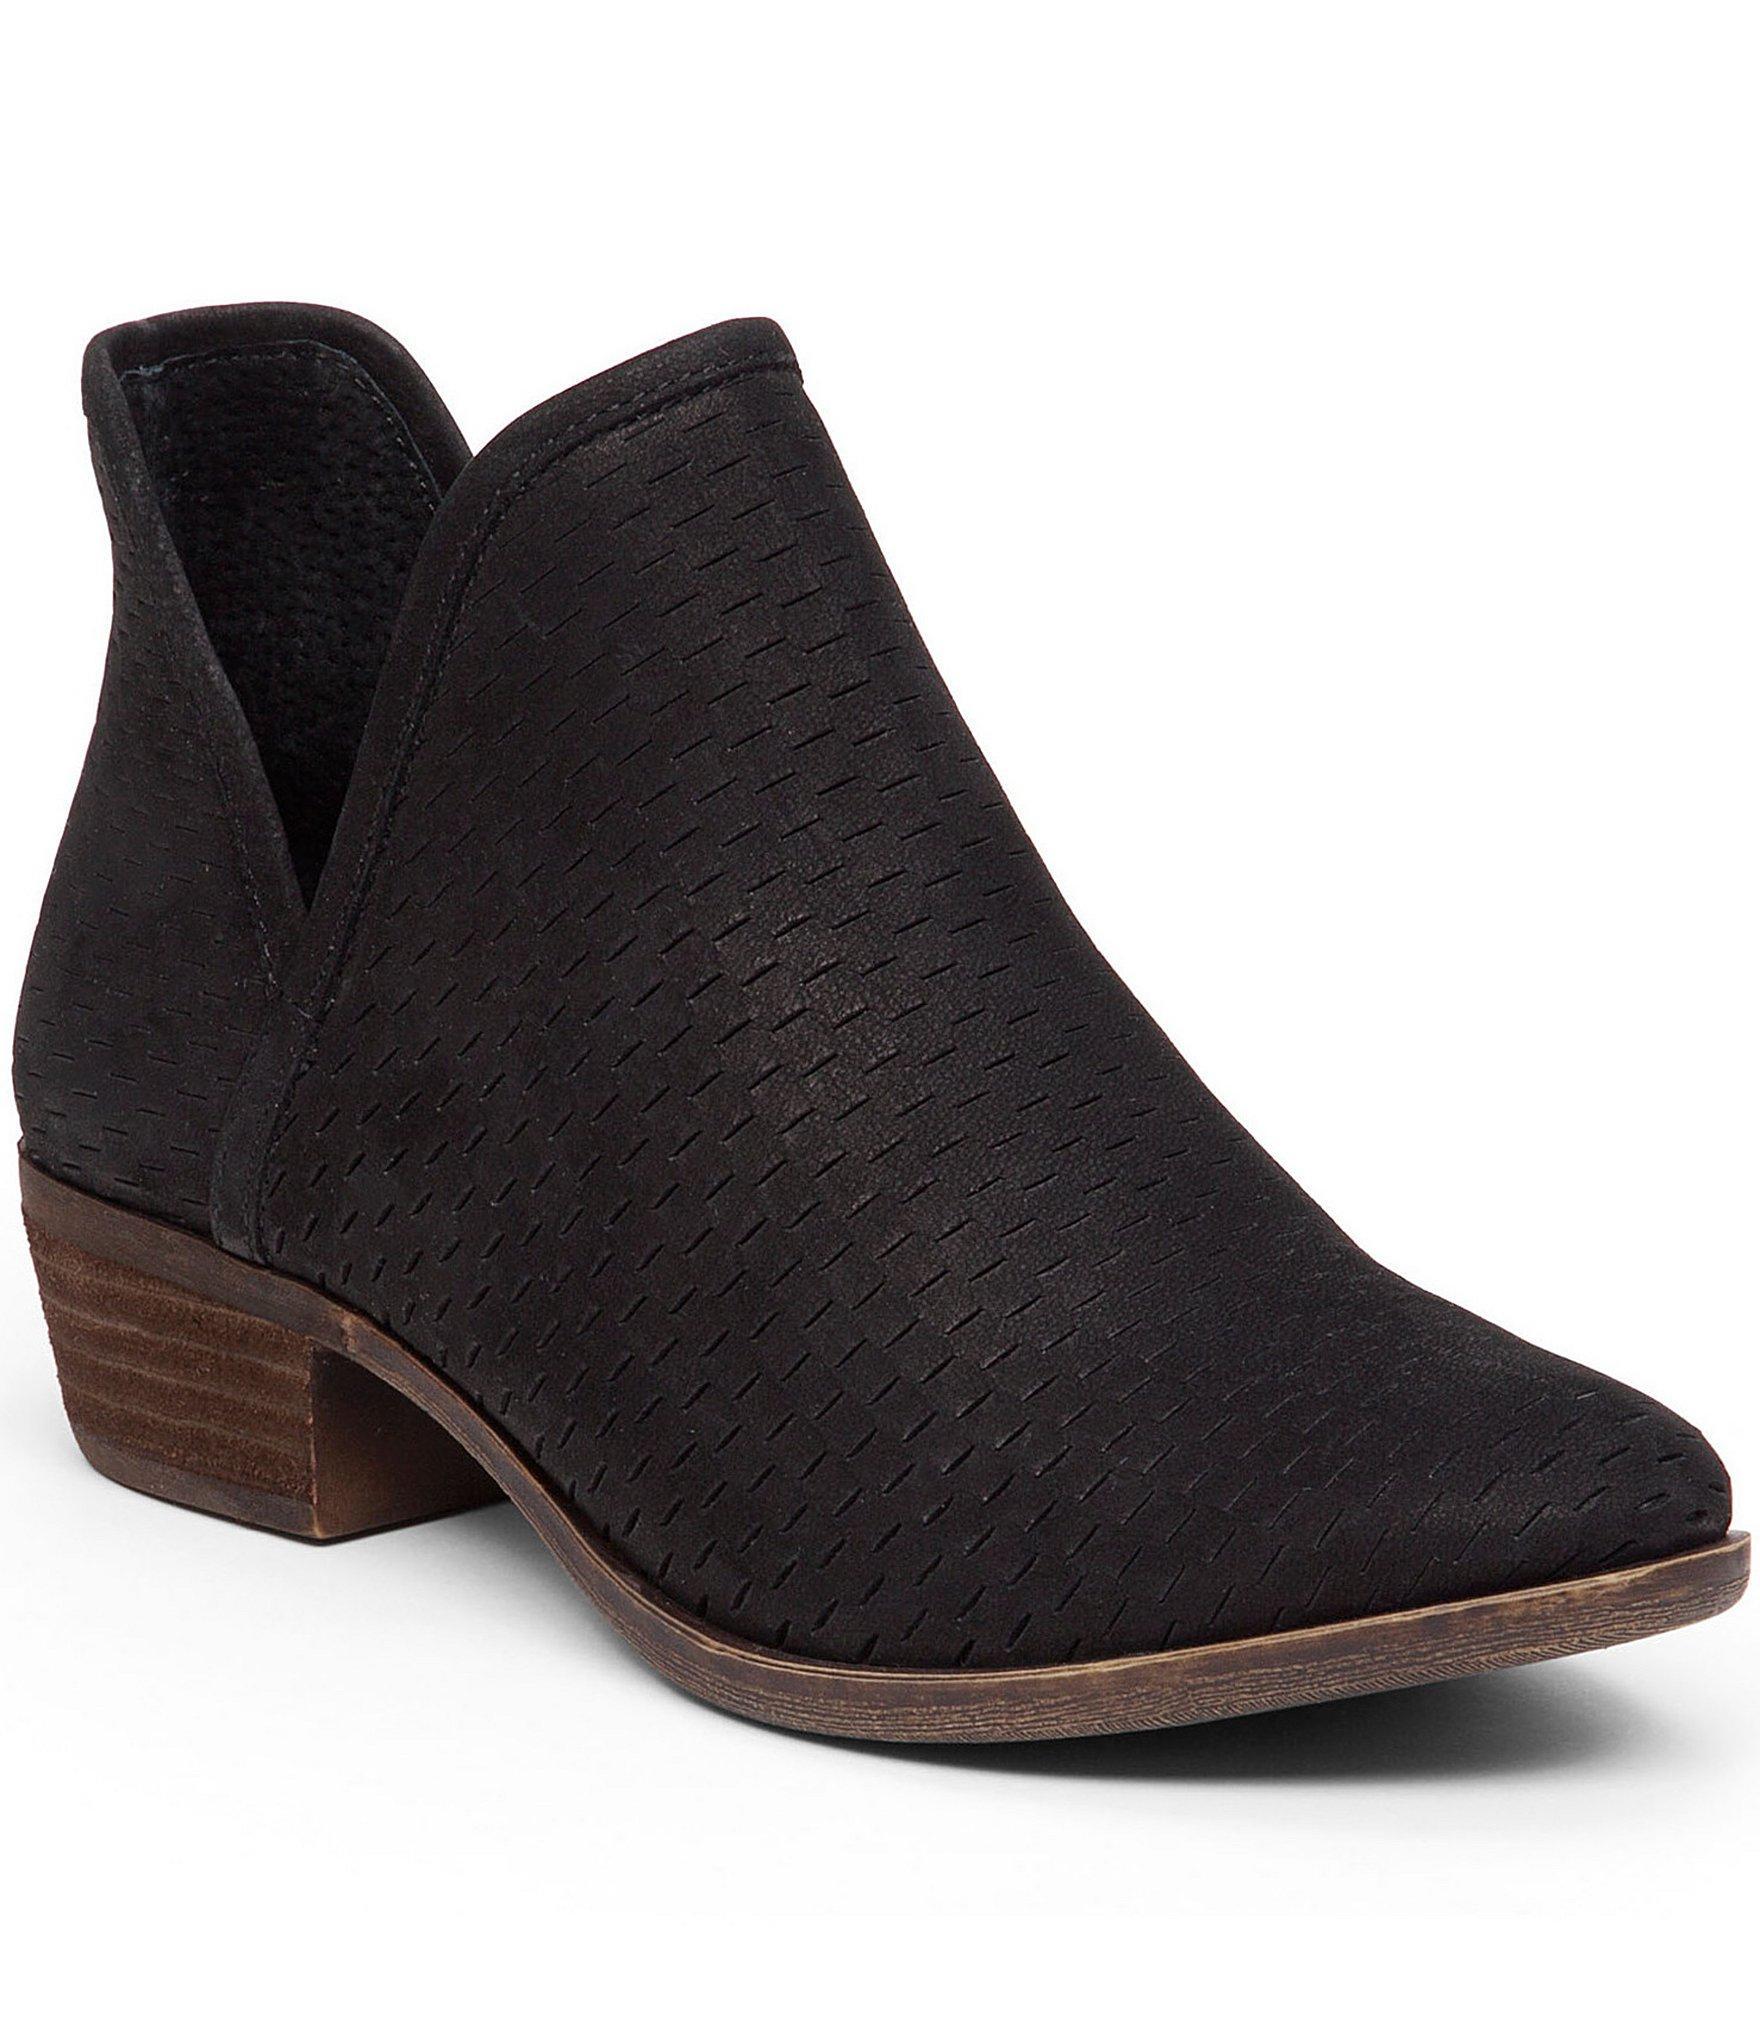 ae80afbf678 Women's Black Bashina Leather Ankle Boots